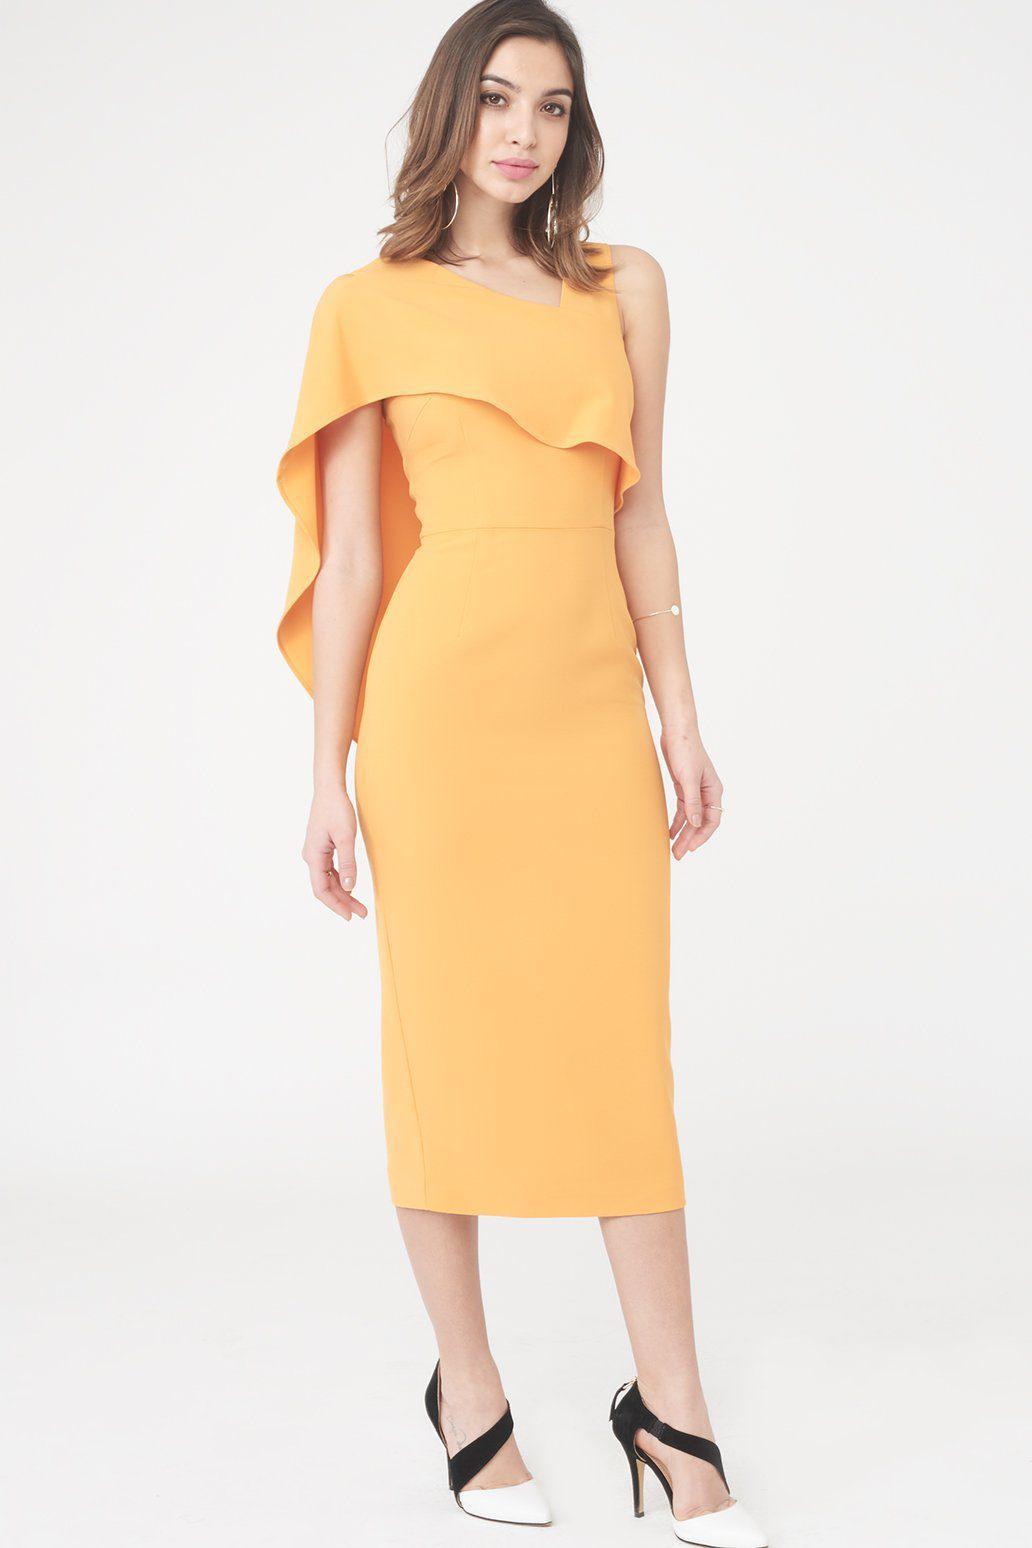 Get Authentic Cheap Online Midi Dress with Drape One Shoulder - Tangerine Lavish Alice Clearance Order In China Cheap Price Cheap Sale Sale Sale Cheapest Price npqq80kJ